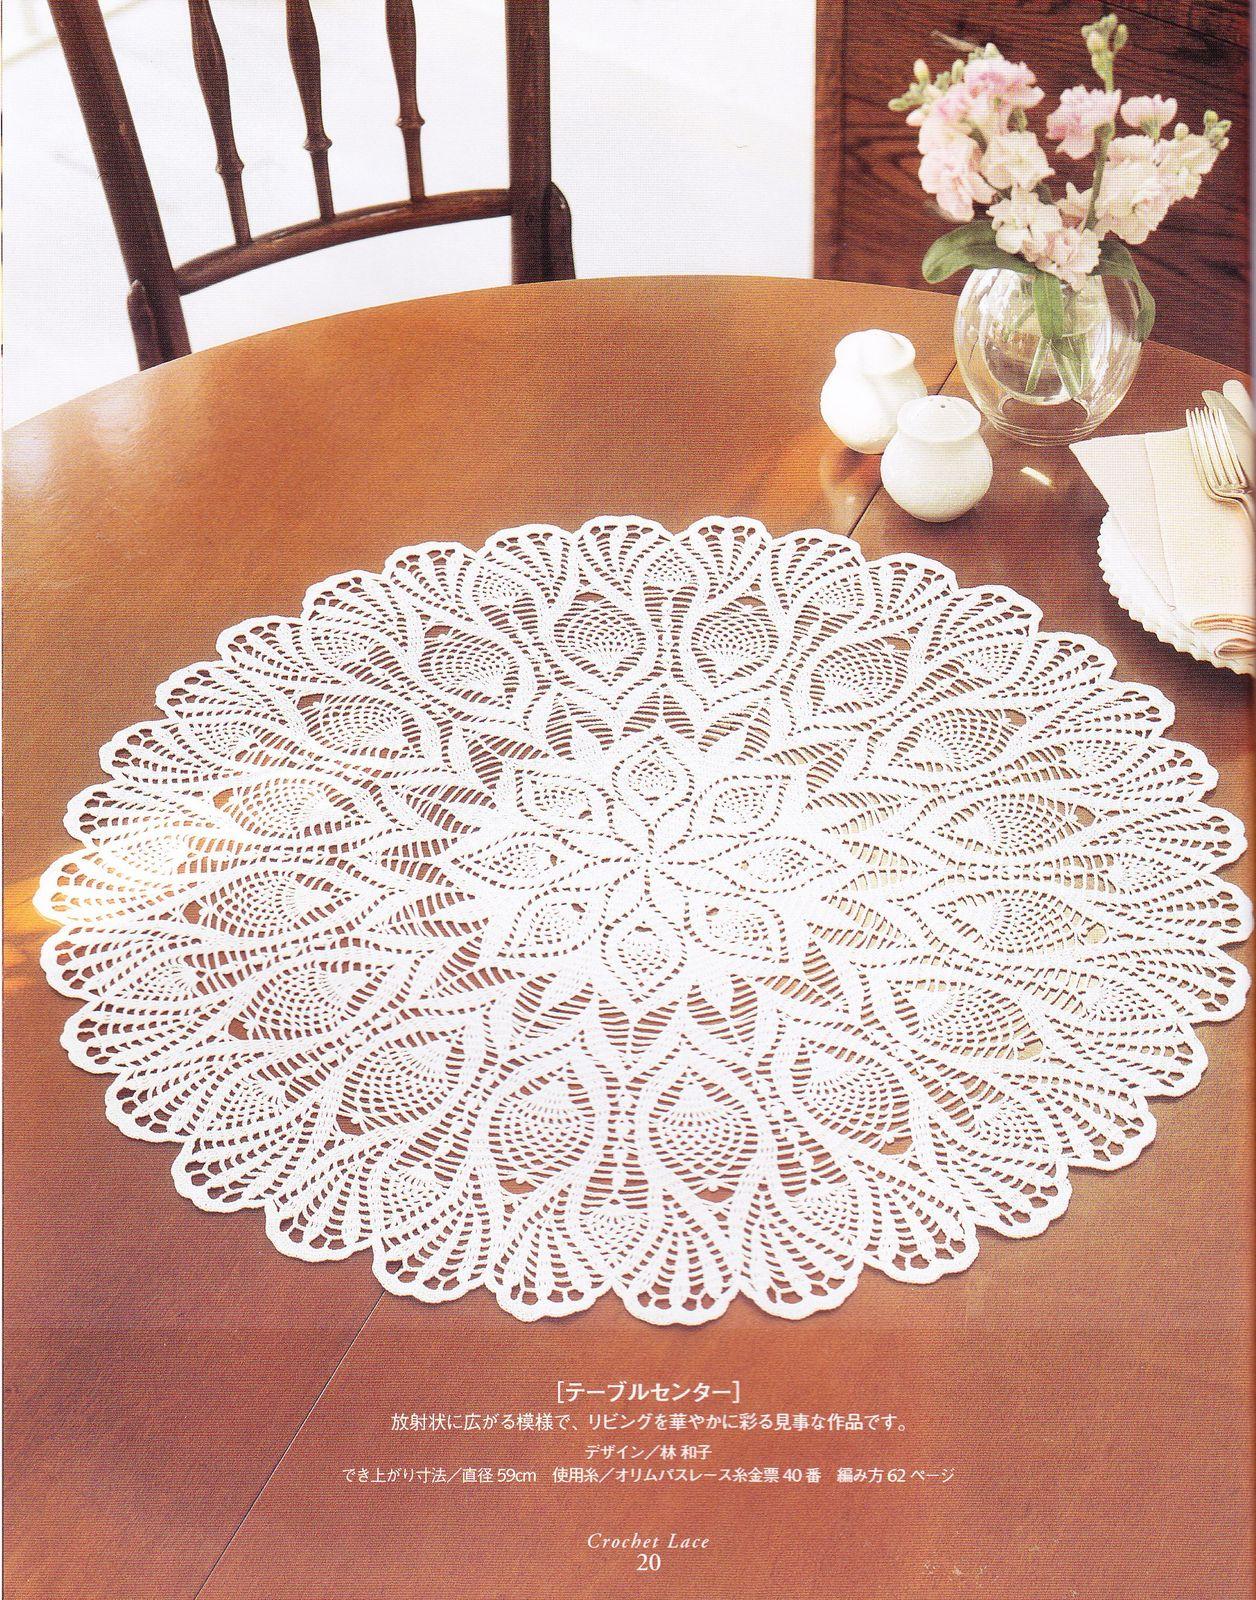 PATRONES GRATIS DE CROCHET: TAPETE, centro de mesa a crochet ...